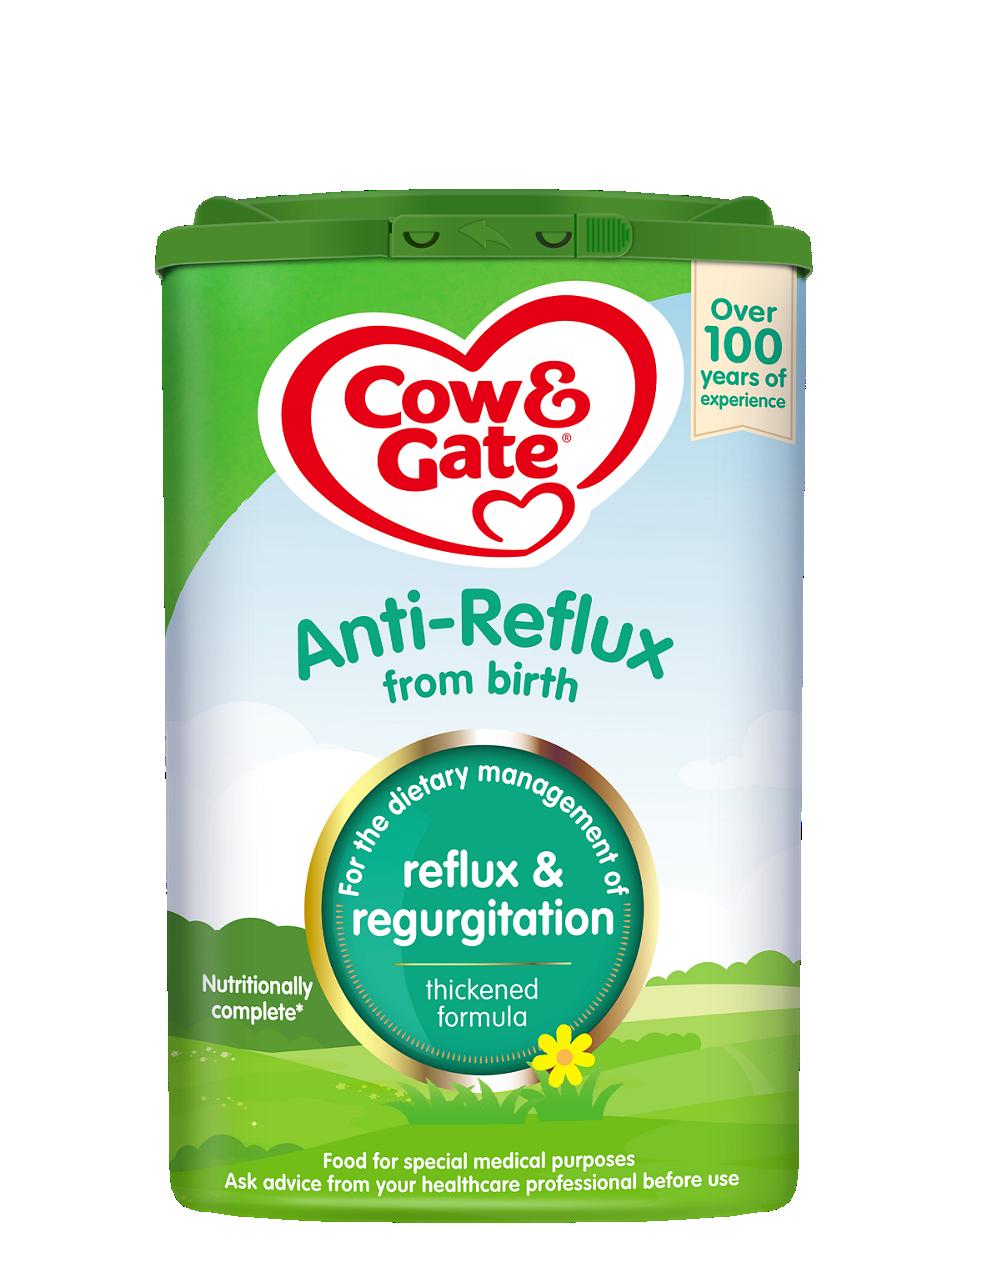 Anti-reflux baby milk